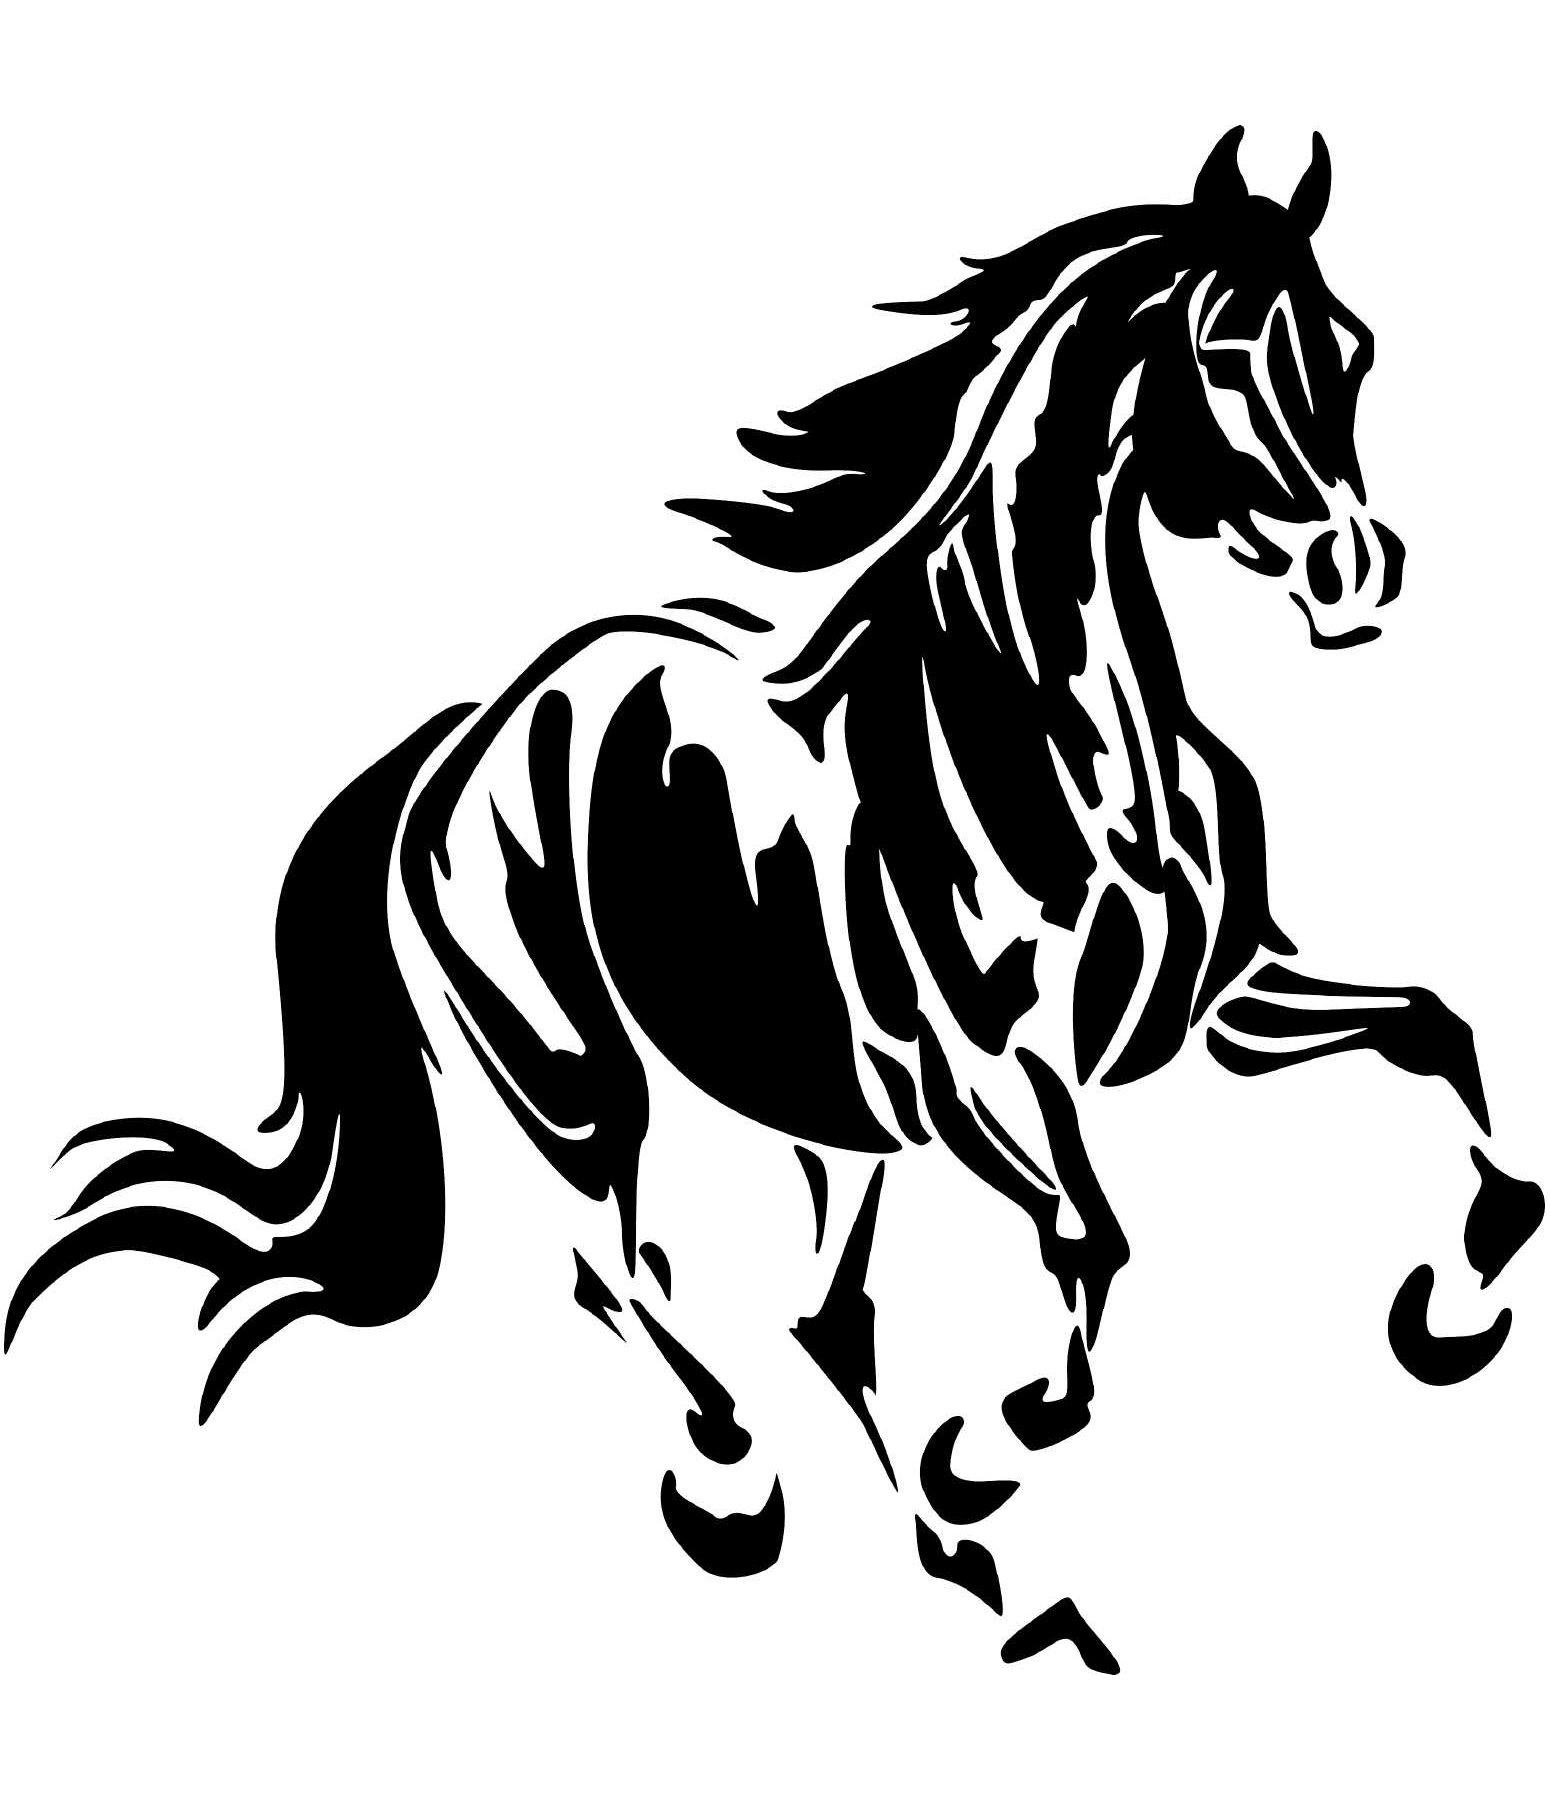 Autoaufkleber pferd aufkleber schreibwaren felix bhler showmaster autoaufkleber pferd 621351 s altavistaventures Images